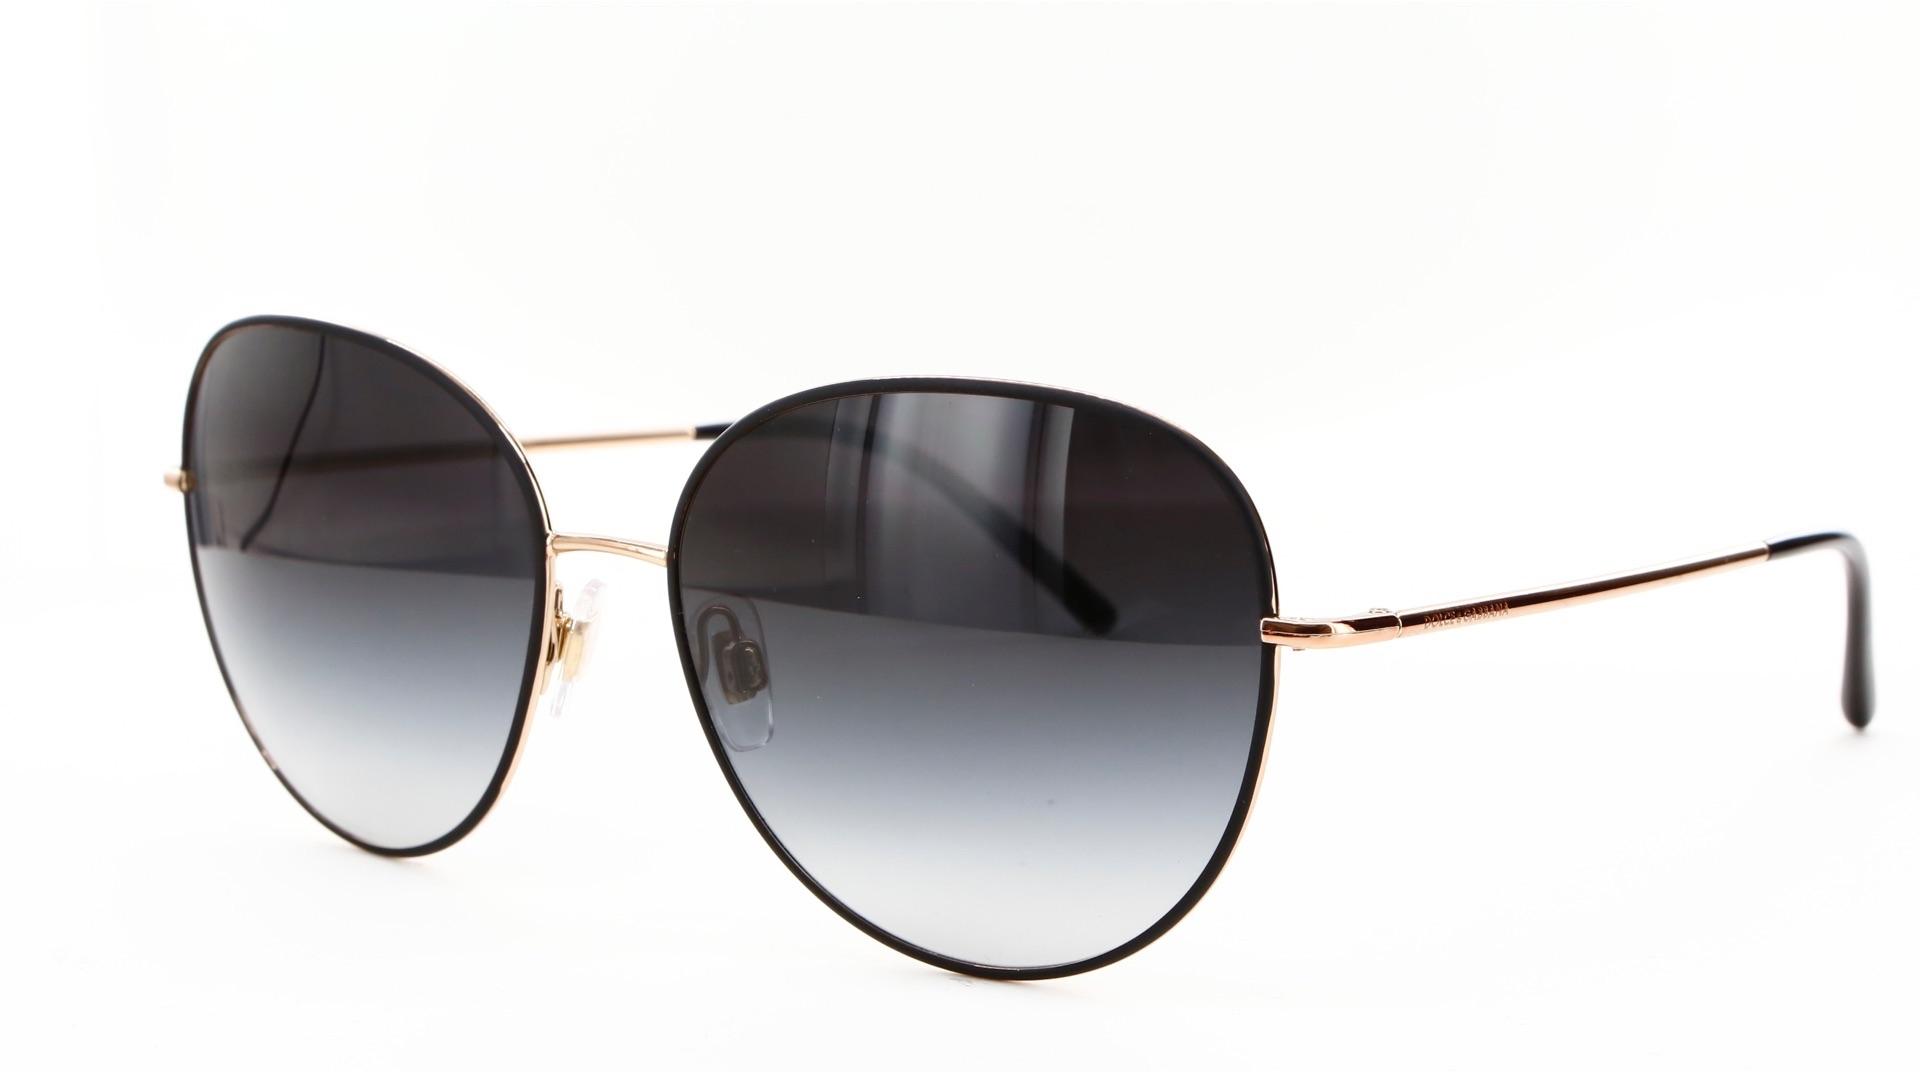 Dolce & Gabbana - ref: 79397